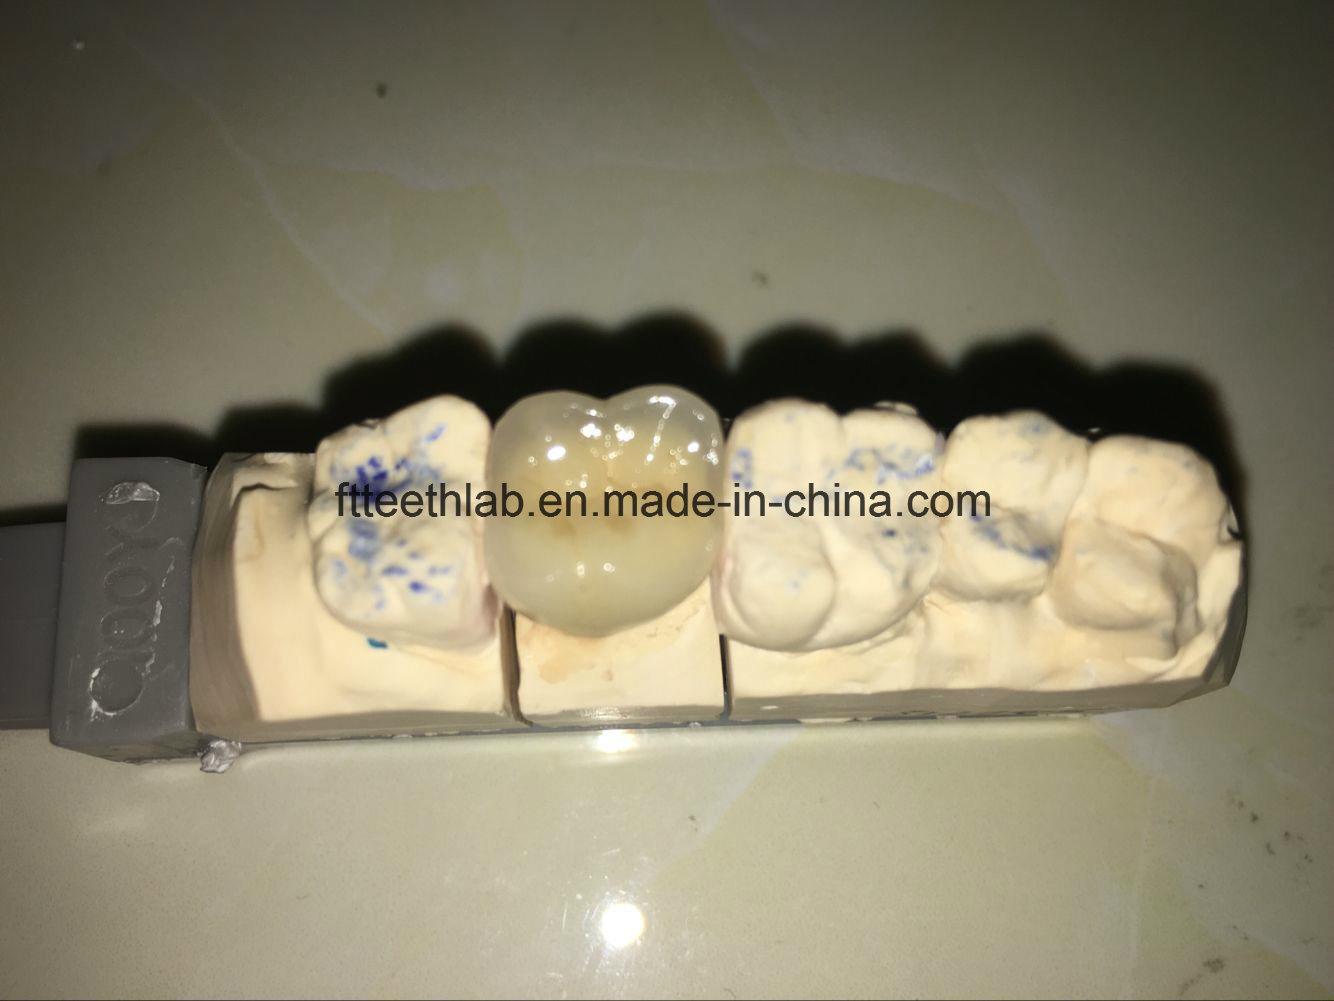 Pfm Crowns and Bridge for Dental Treatment Restorations